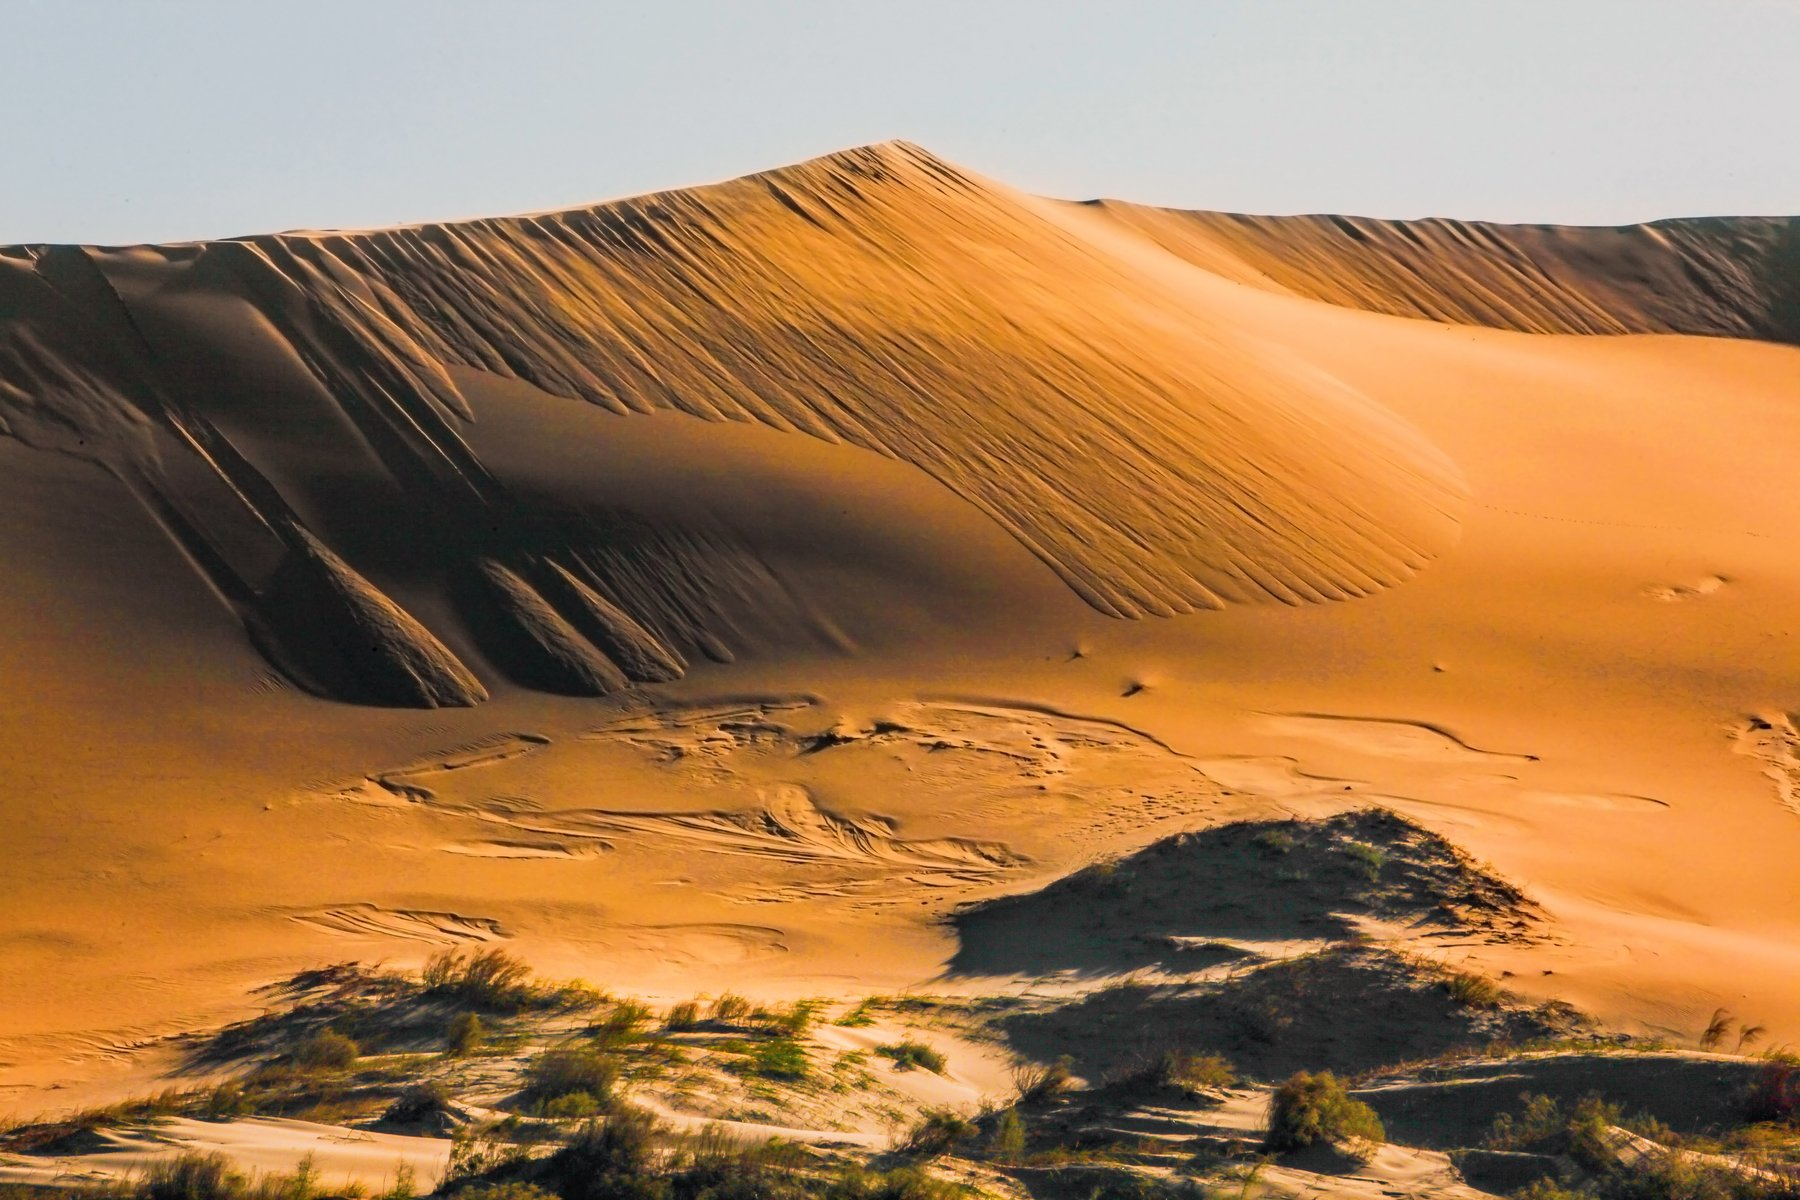 песок,пустыня,песчаная гора,дагестан.бархан, Марат Магов